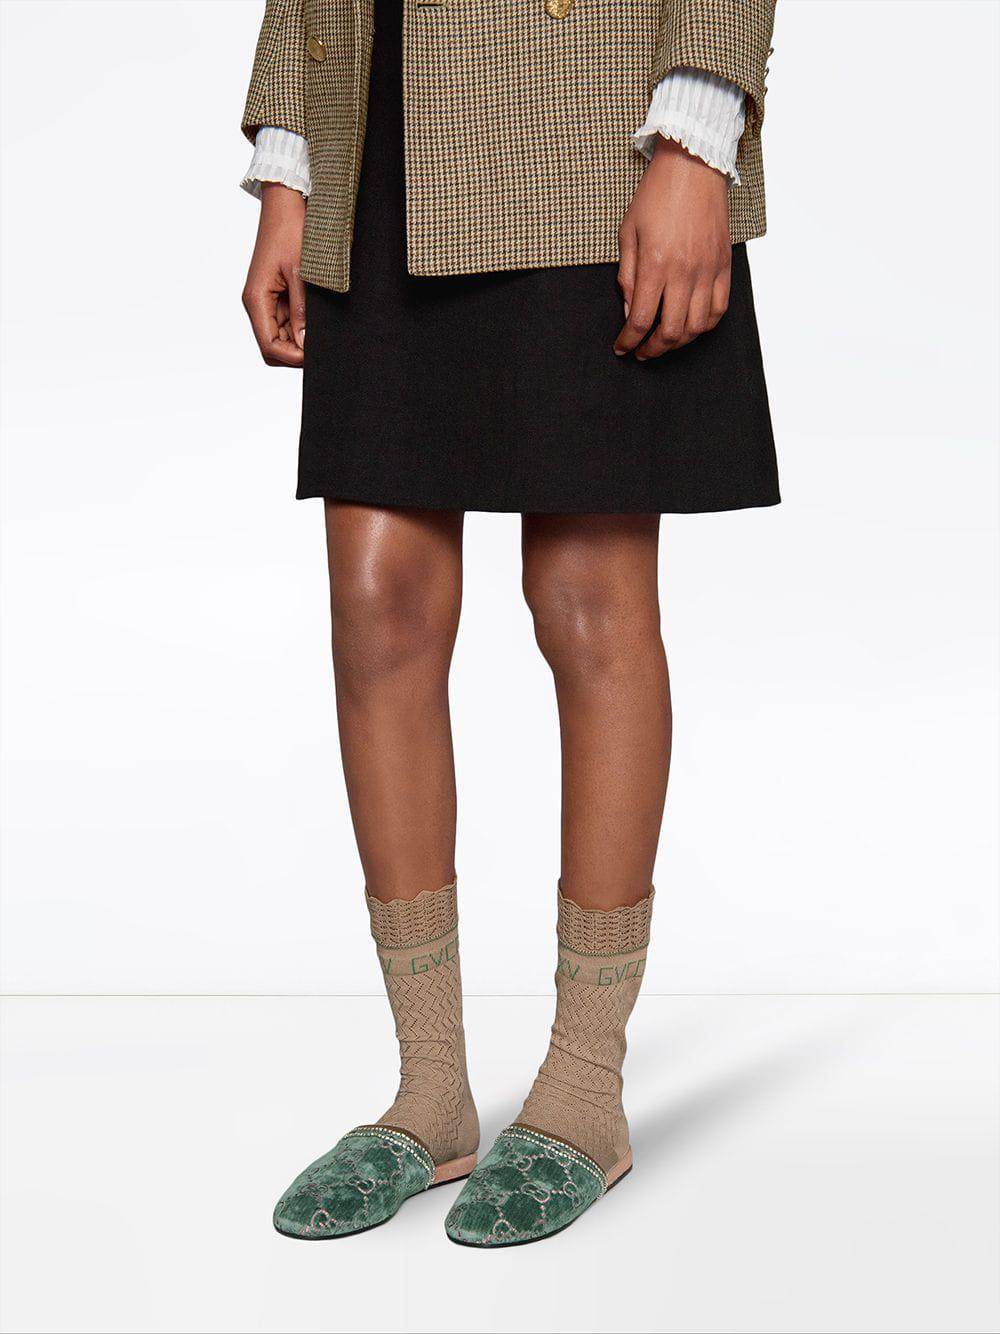 239445bca Gucci GG Velvet Slippers in Blue - Save 1% - Lyst